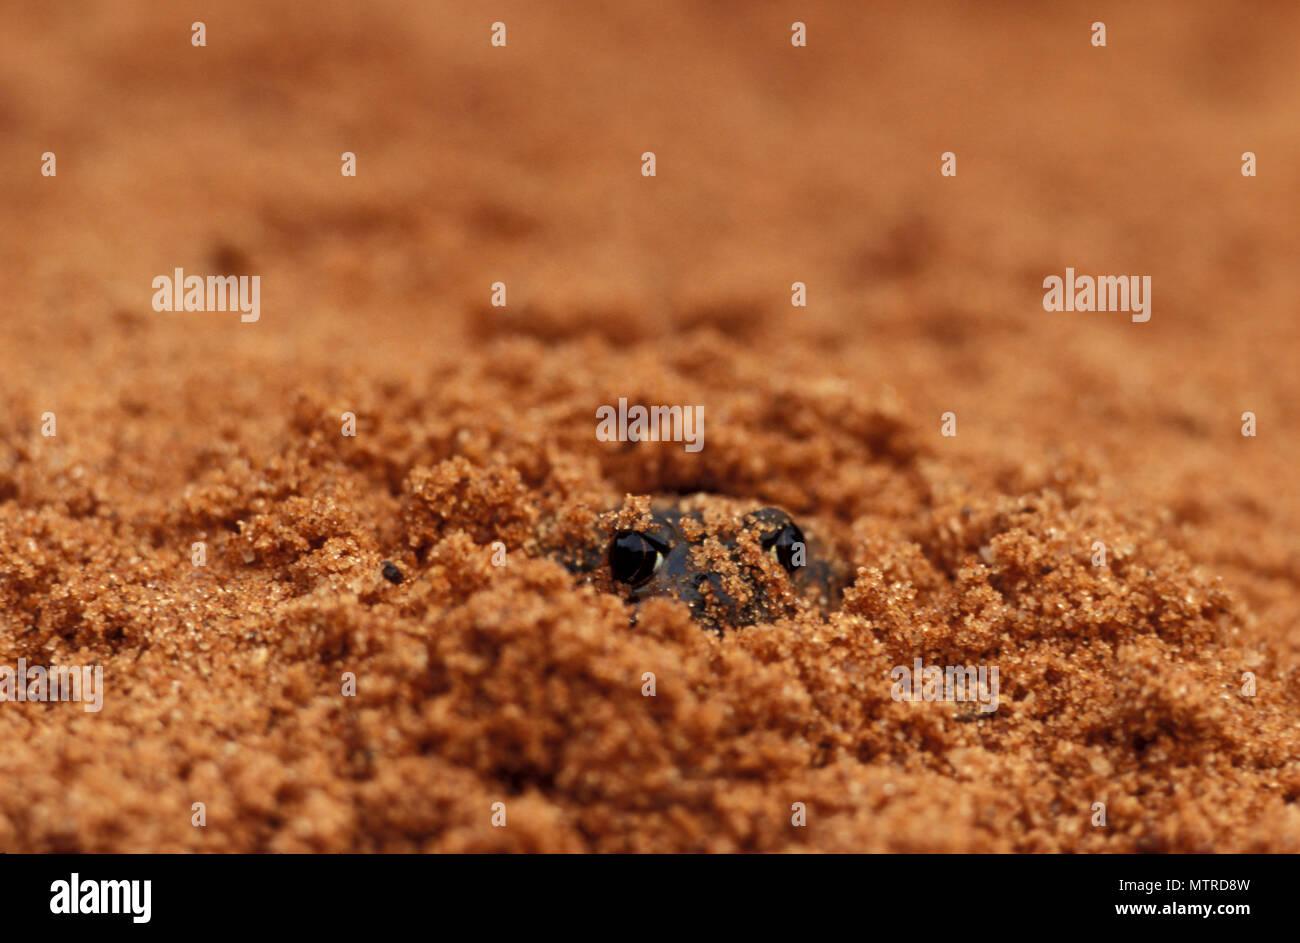 KUNAPALARI KUNAPALARI NEOBATRACHUS (grenouille) Goldfields, l'ouest de l'Australie Banque D'Images